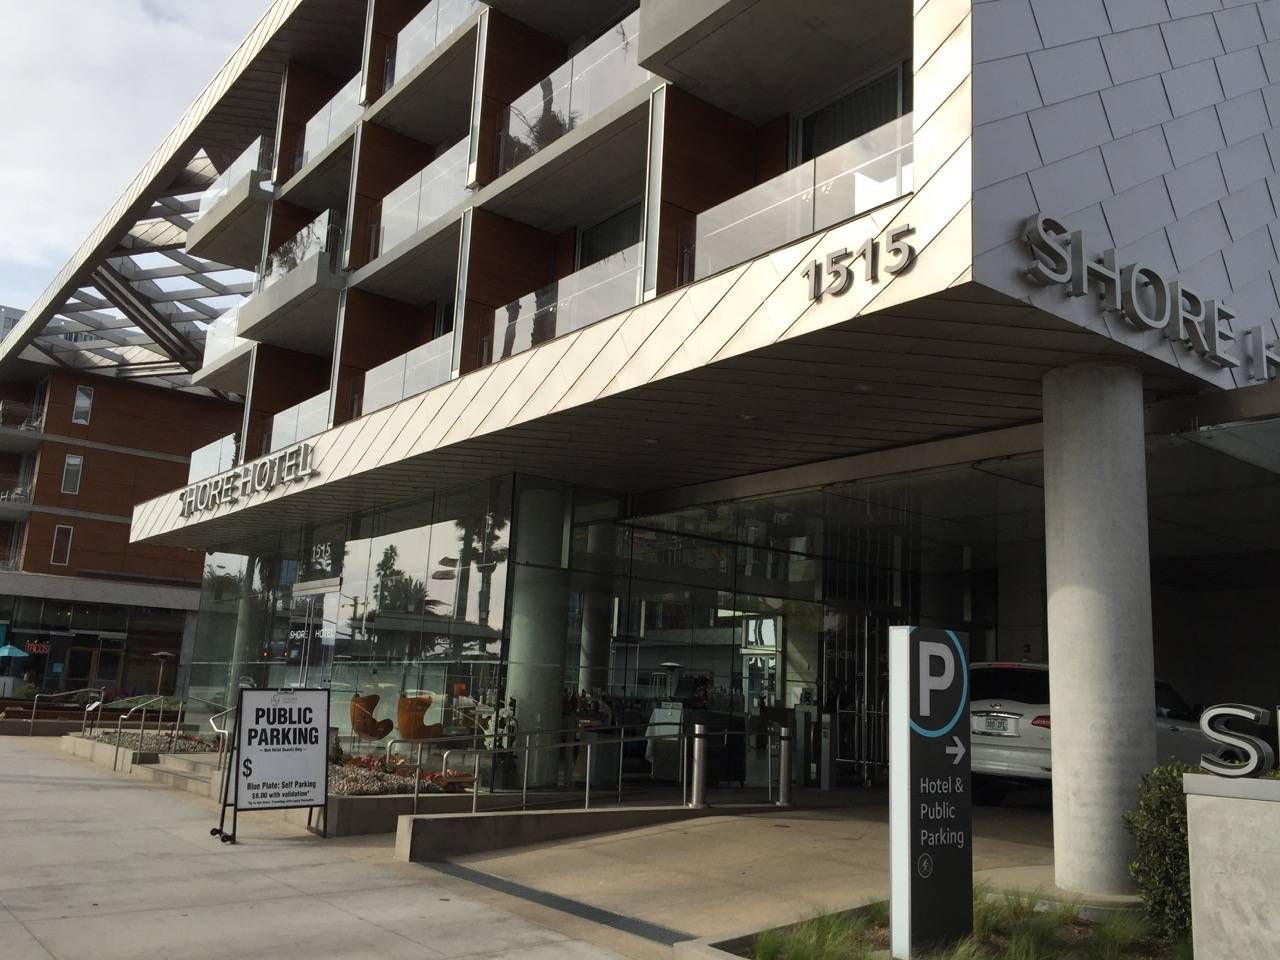 Shore Hotel Santa Monica-019